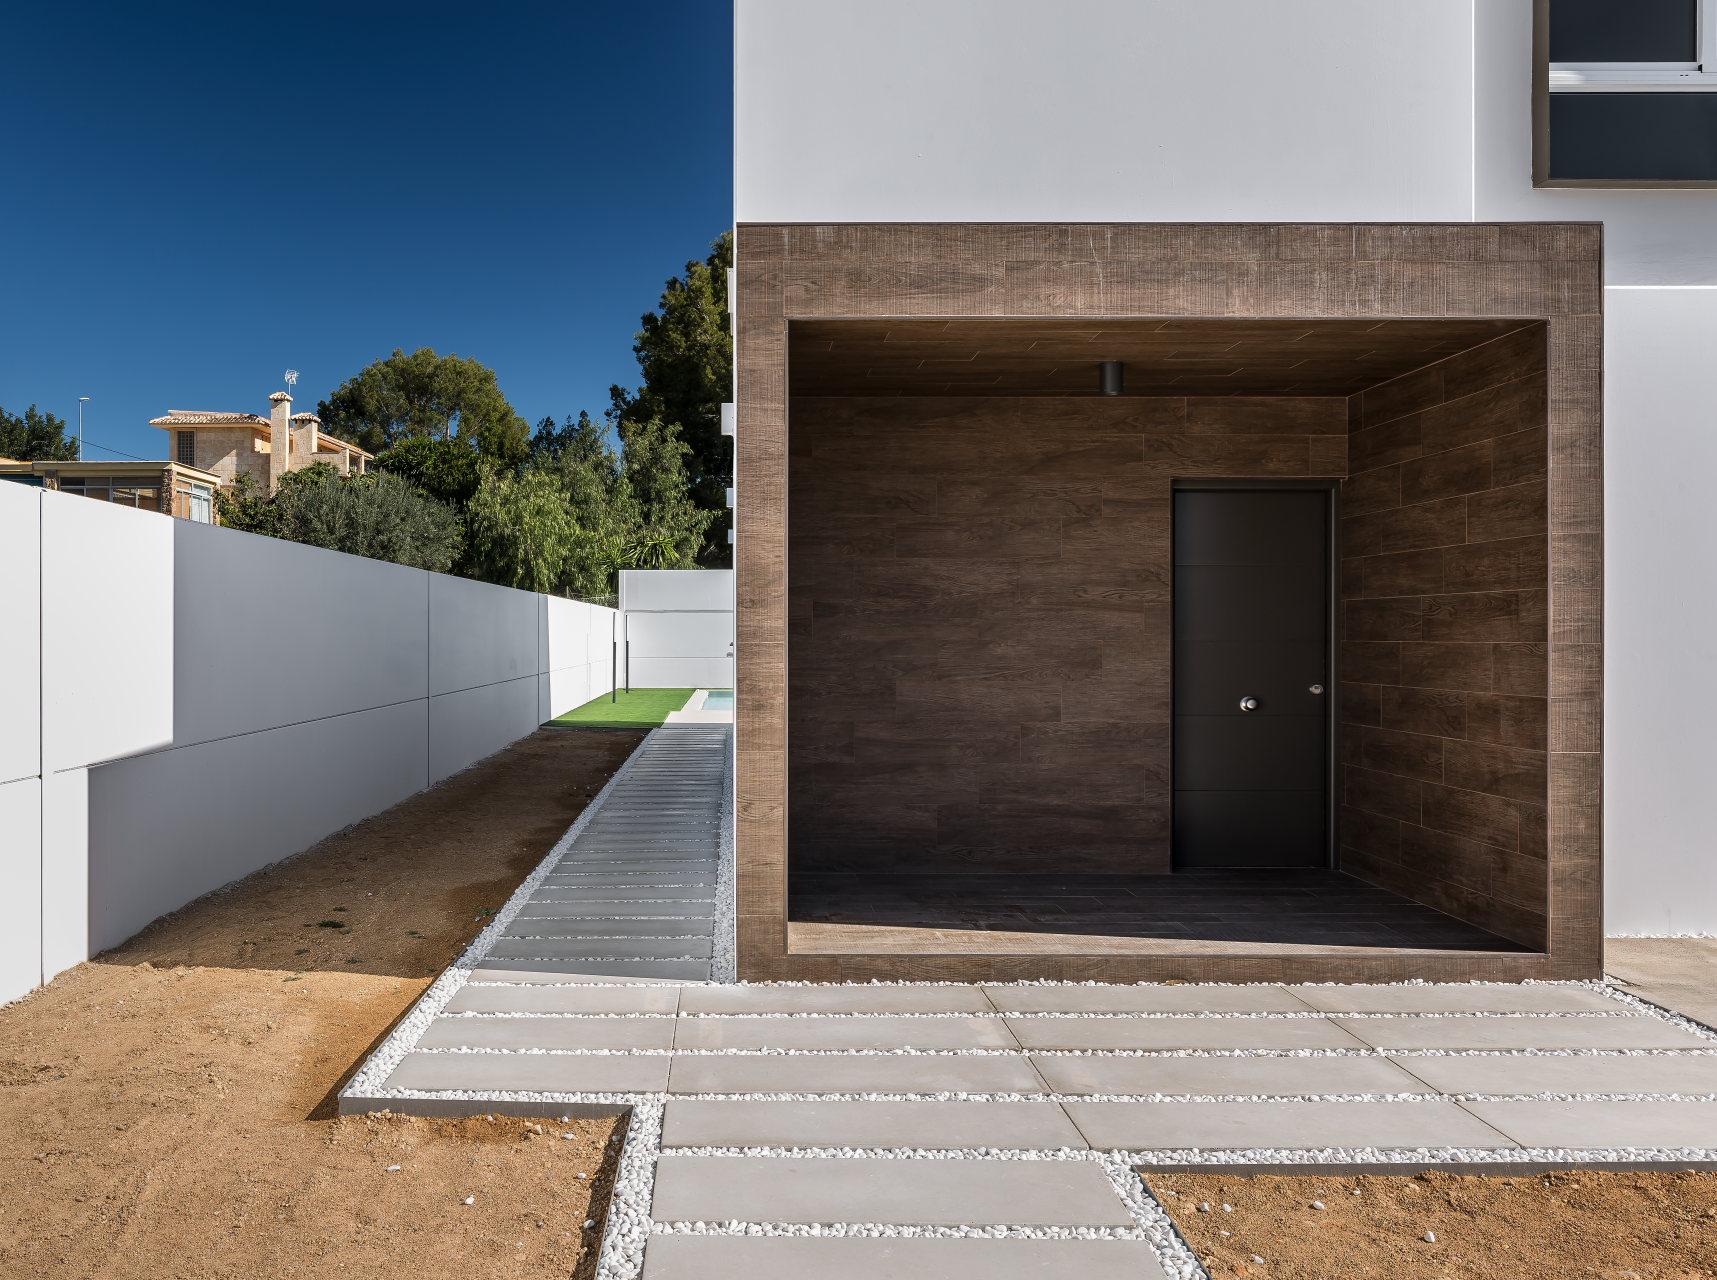 fotografia-arquitectura-valencia-german-cabo-viraje-san-antonio (12)